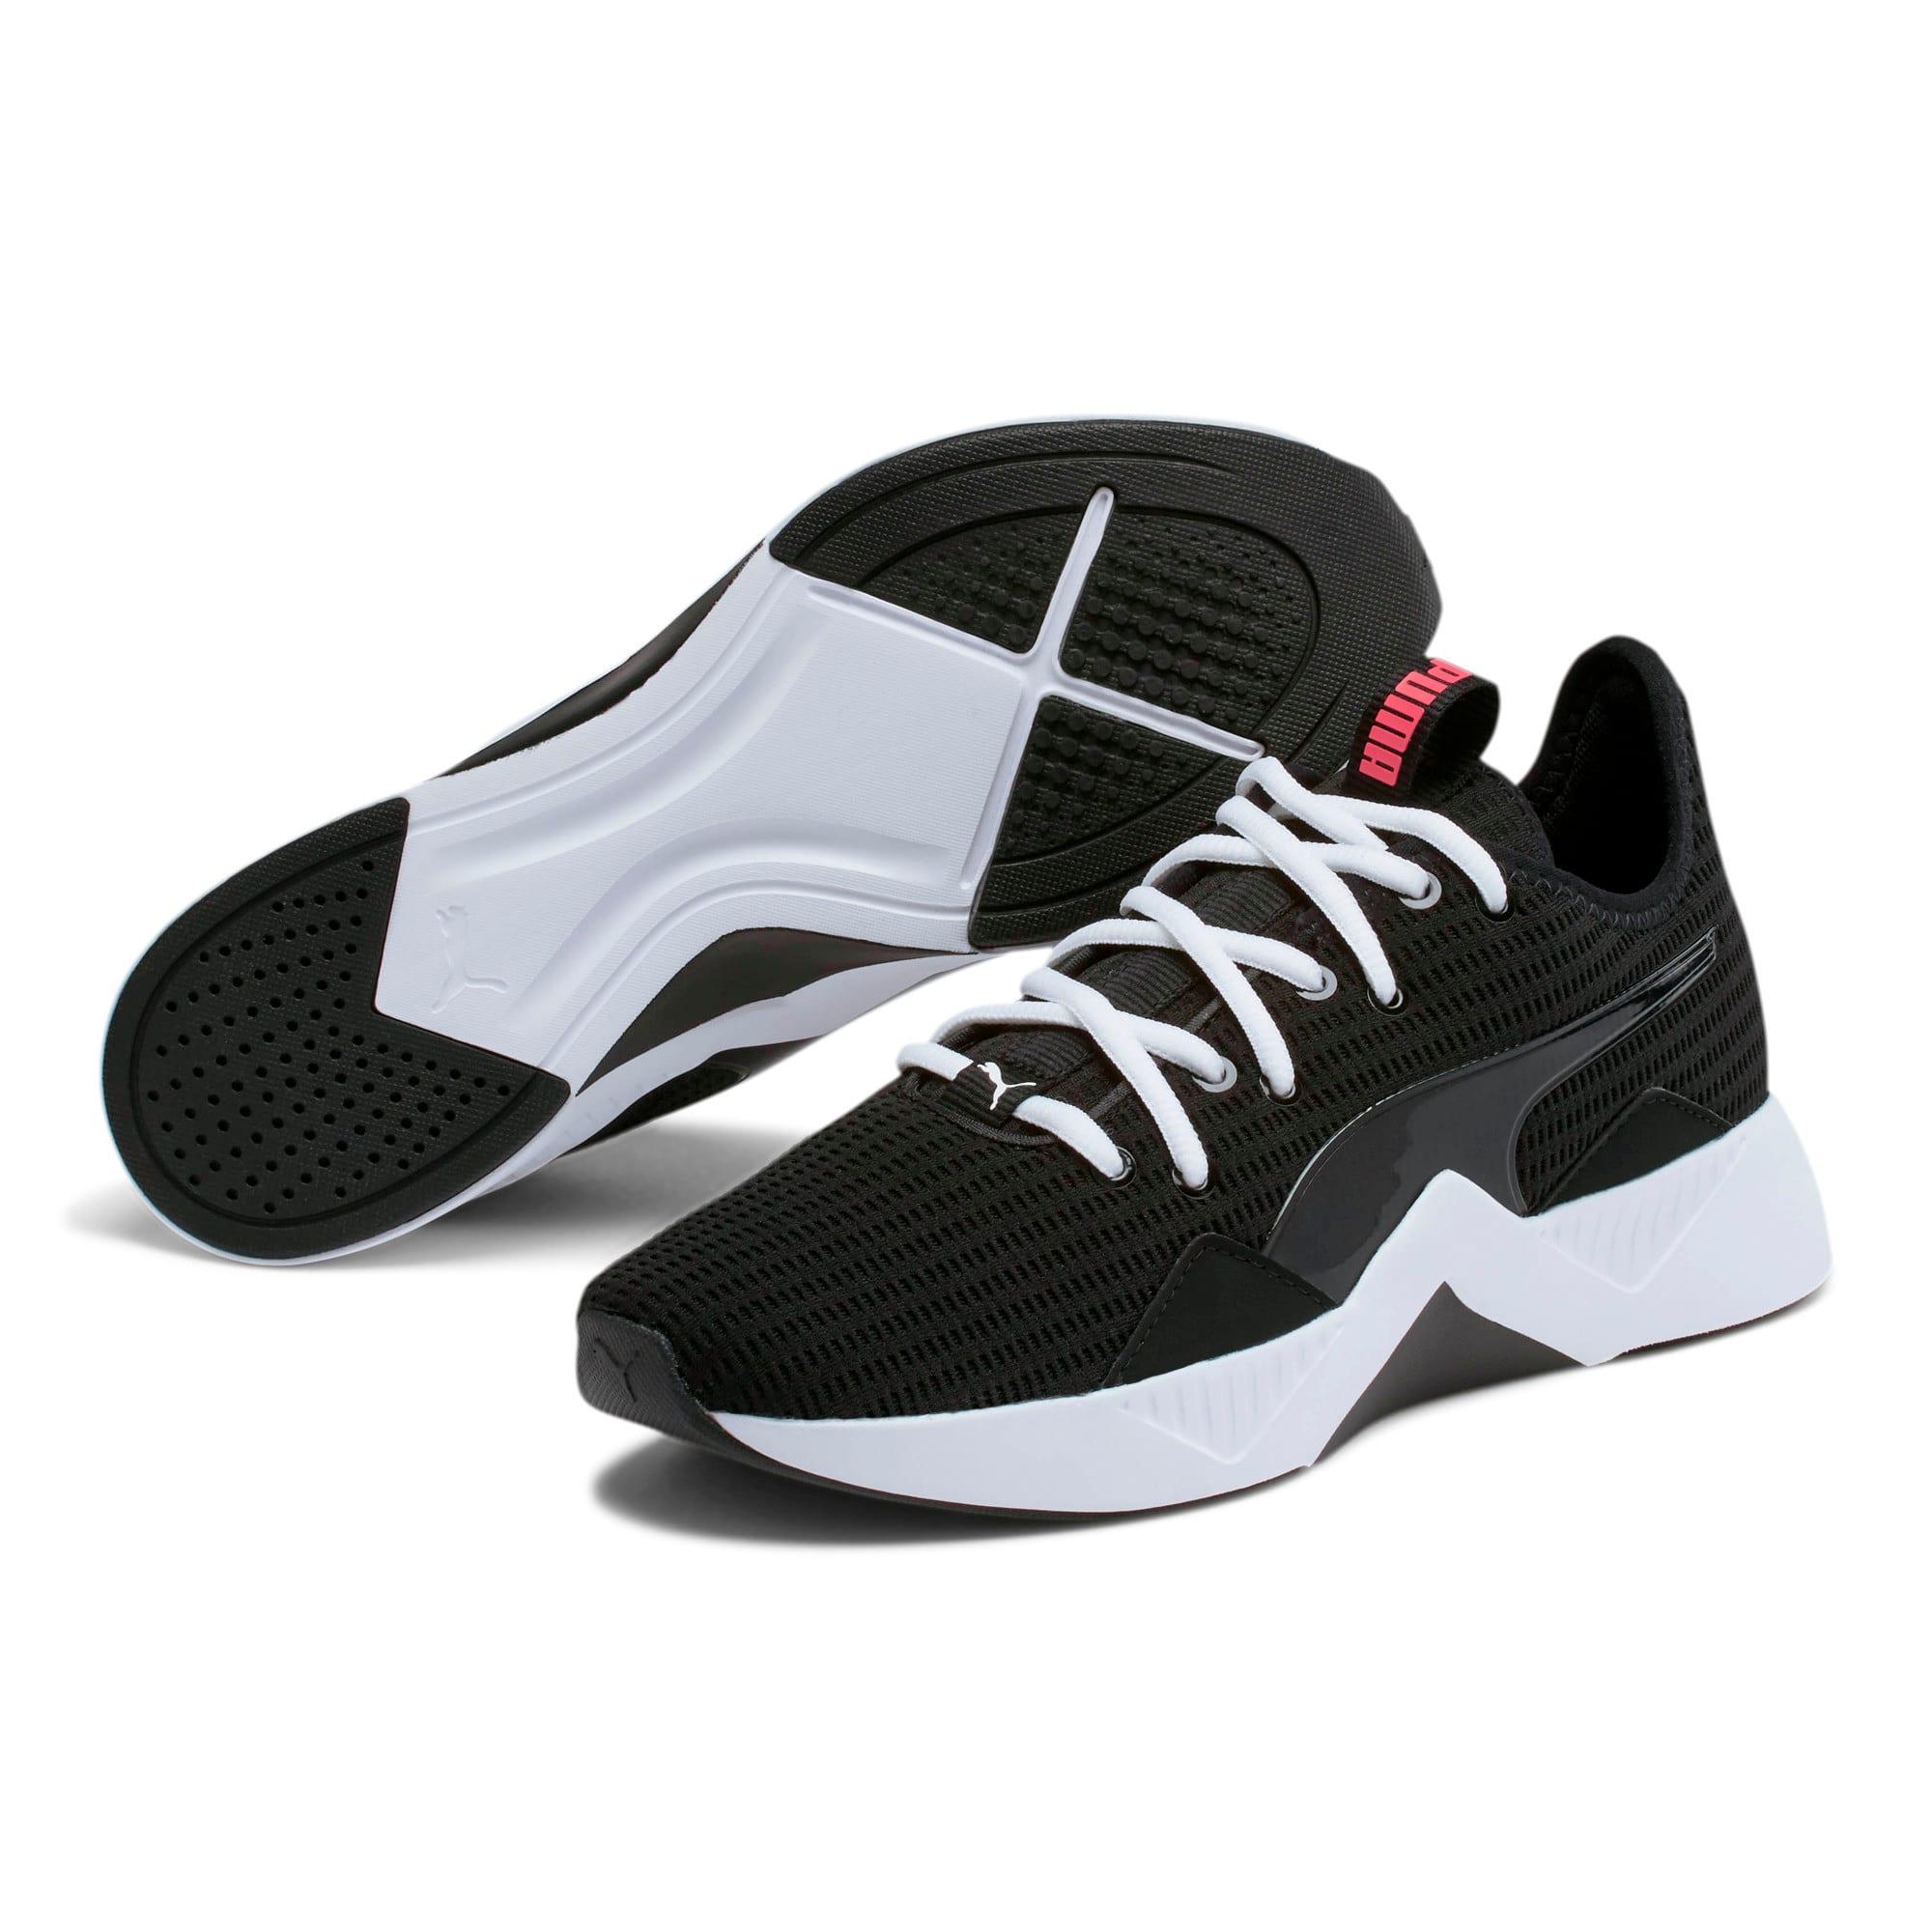 Thumbnail 3 of Incite FS Shift Women's Training Shoes, Puma Black-Nrgy Rose, medium